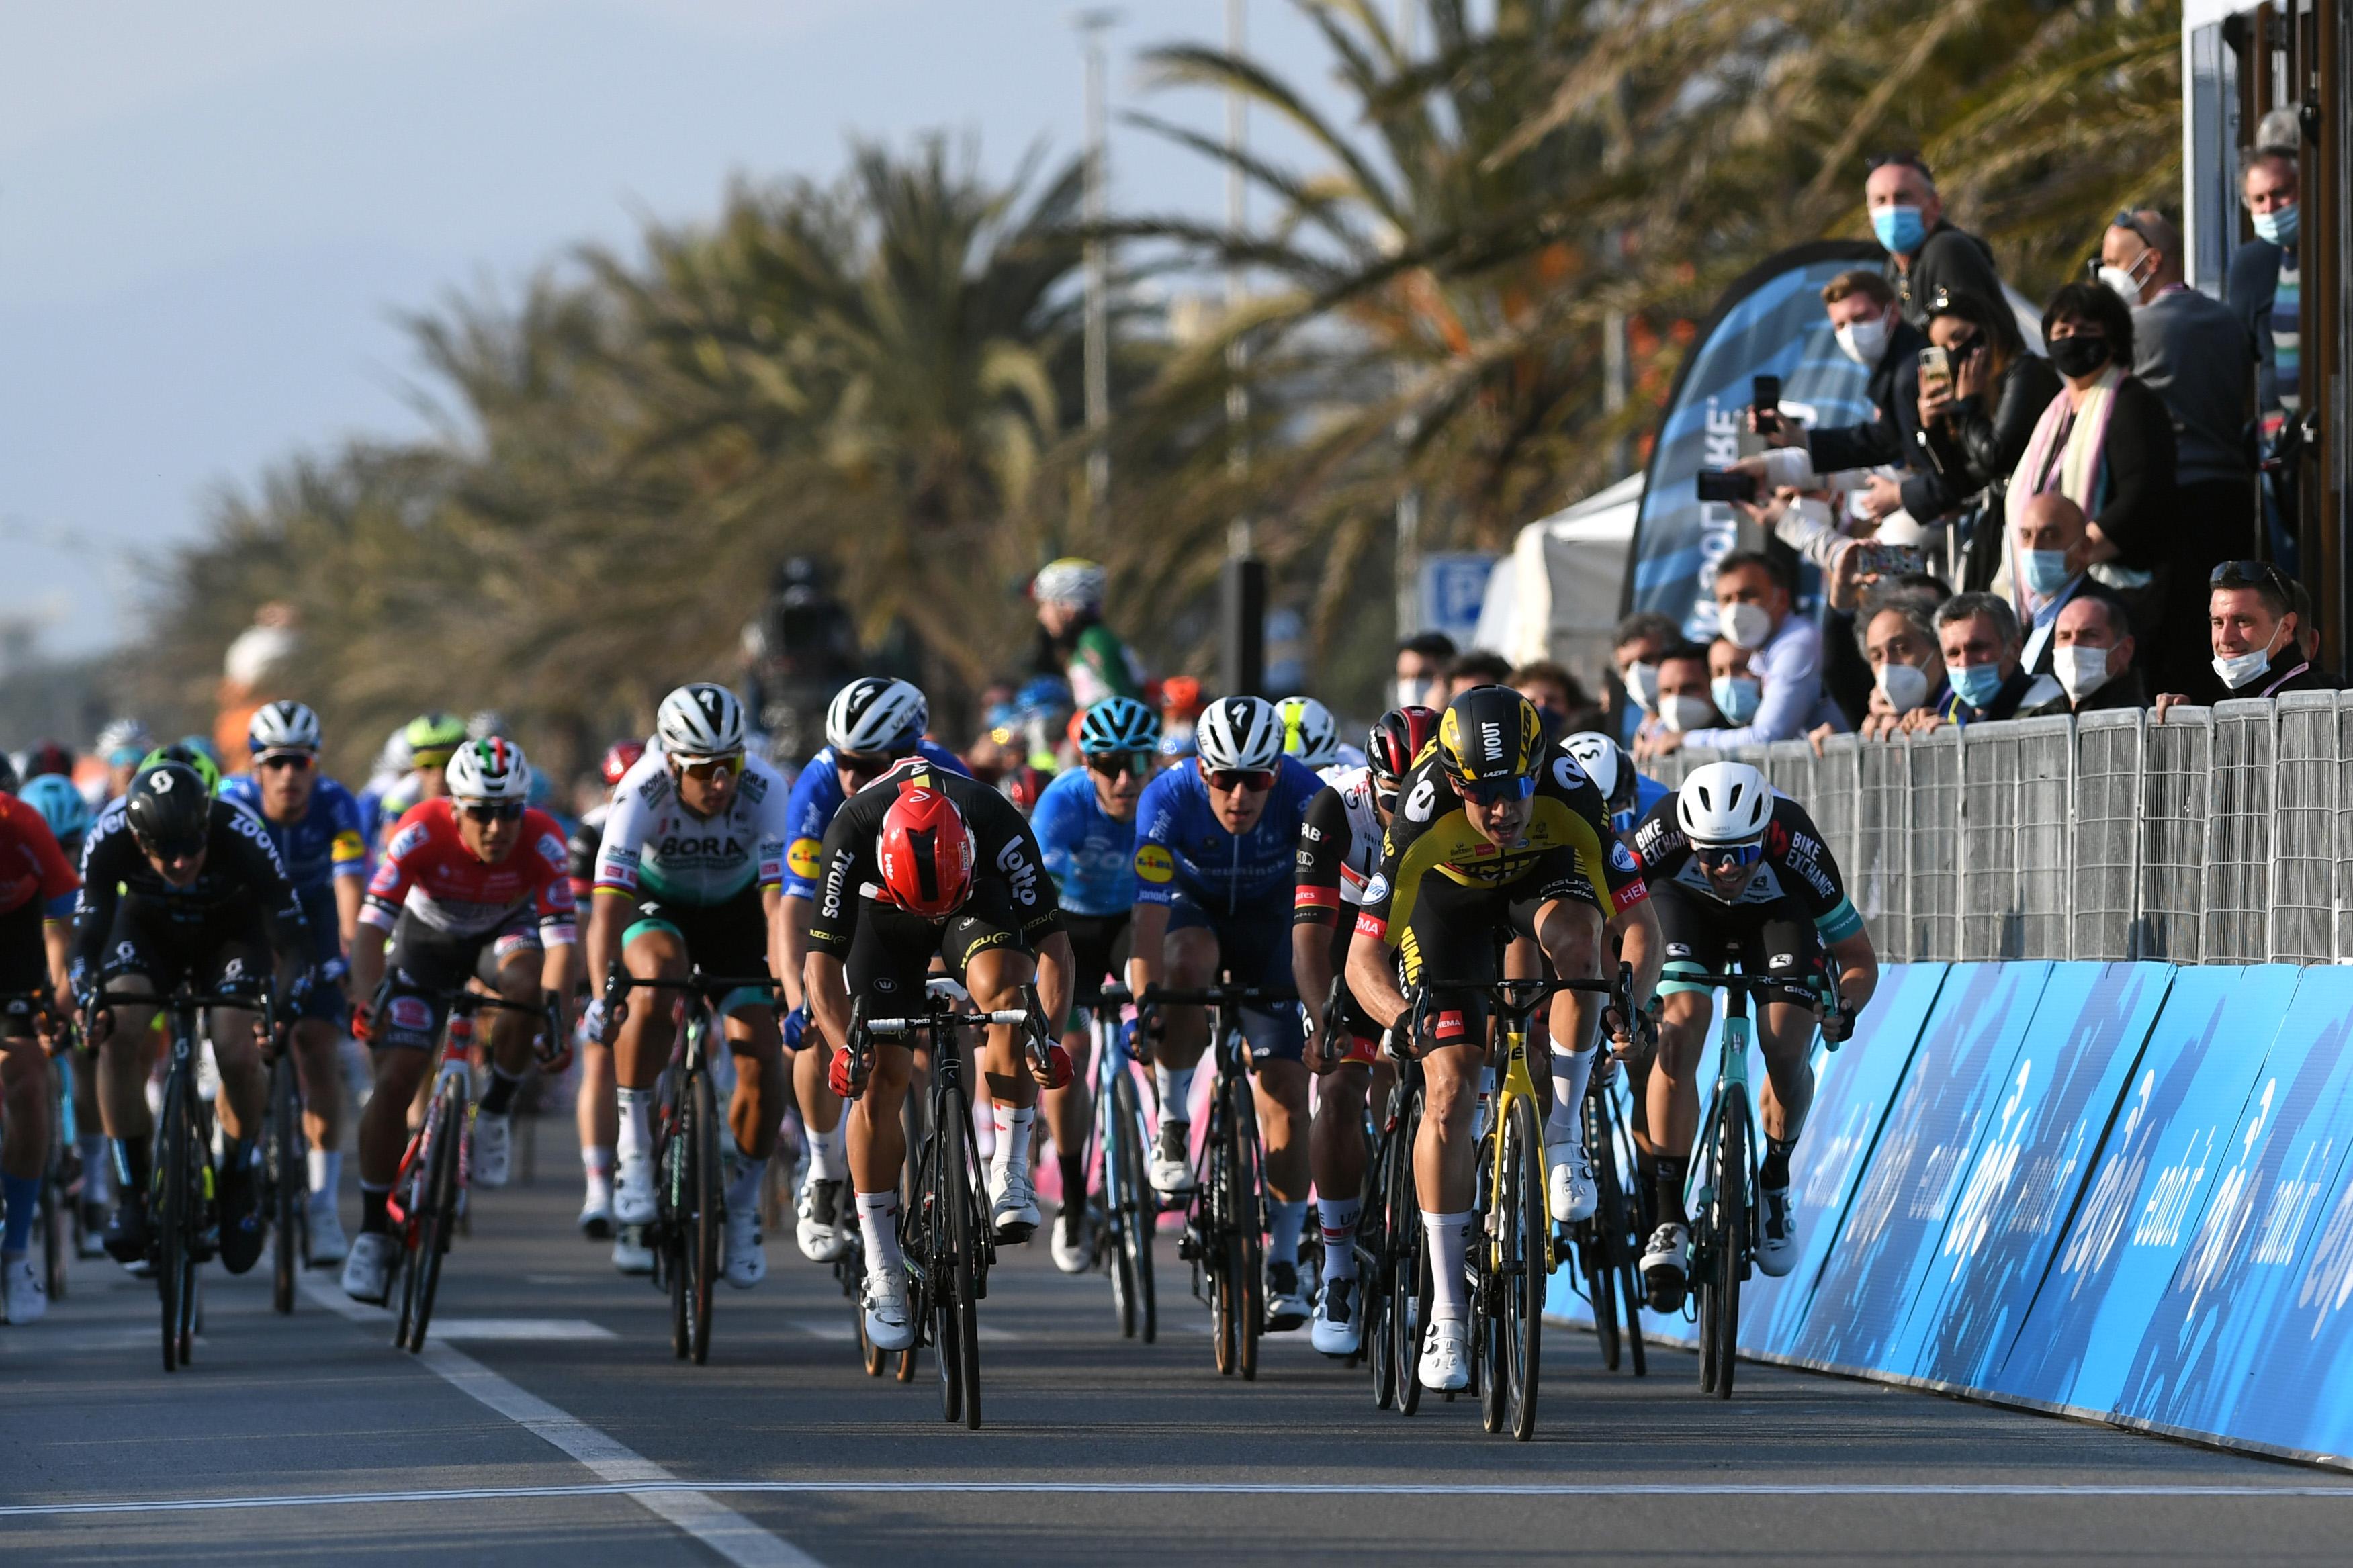 Wout van Aert wins stage 1 of the 2021 Tirreno-Adriatico.